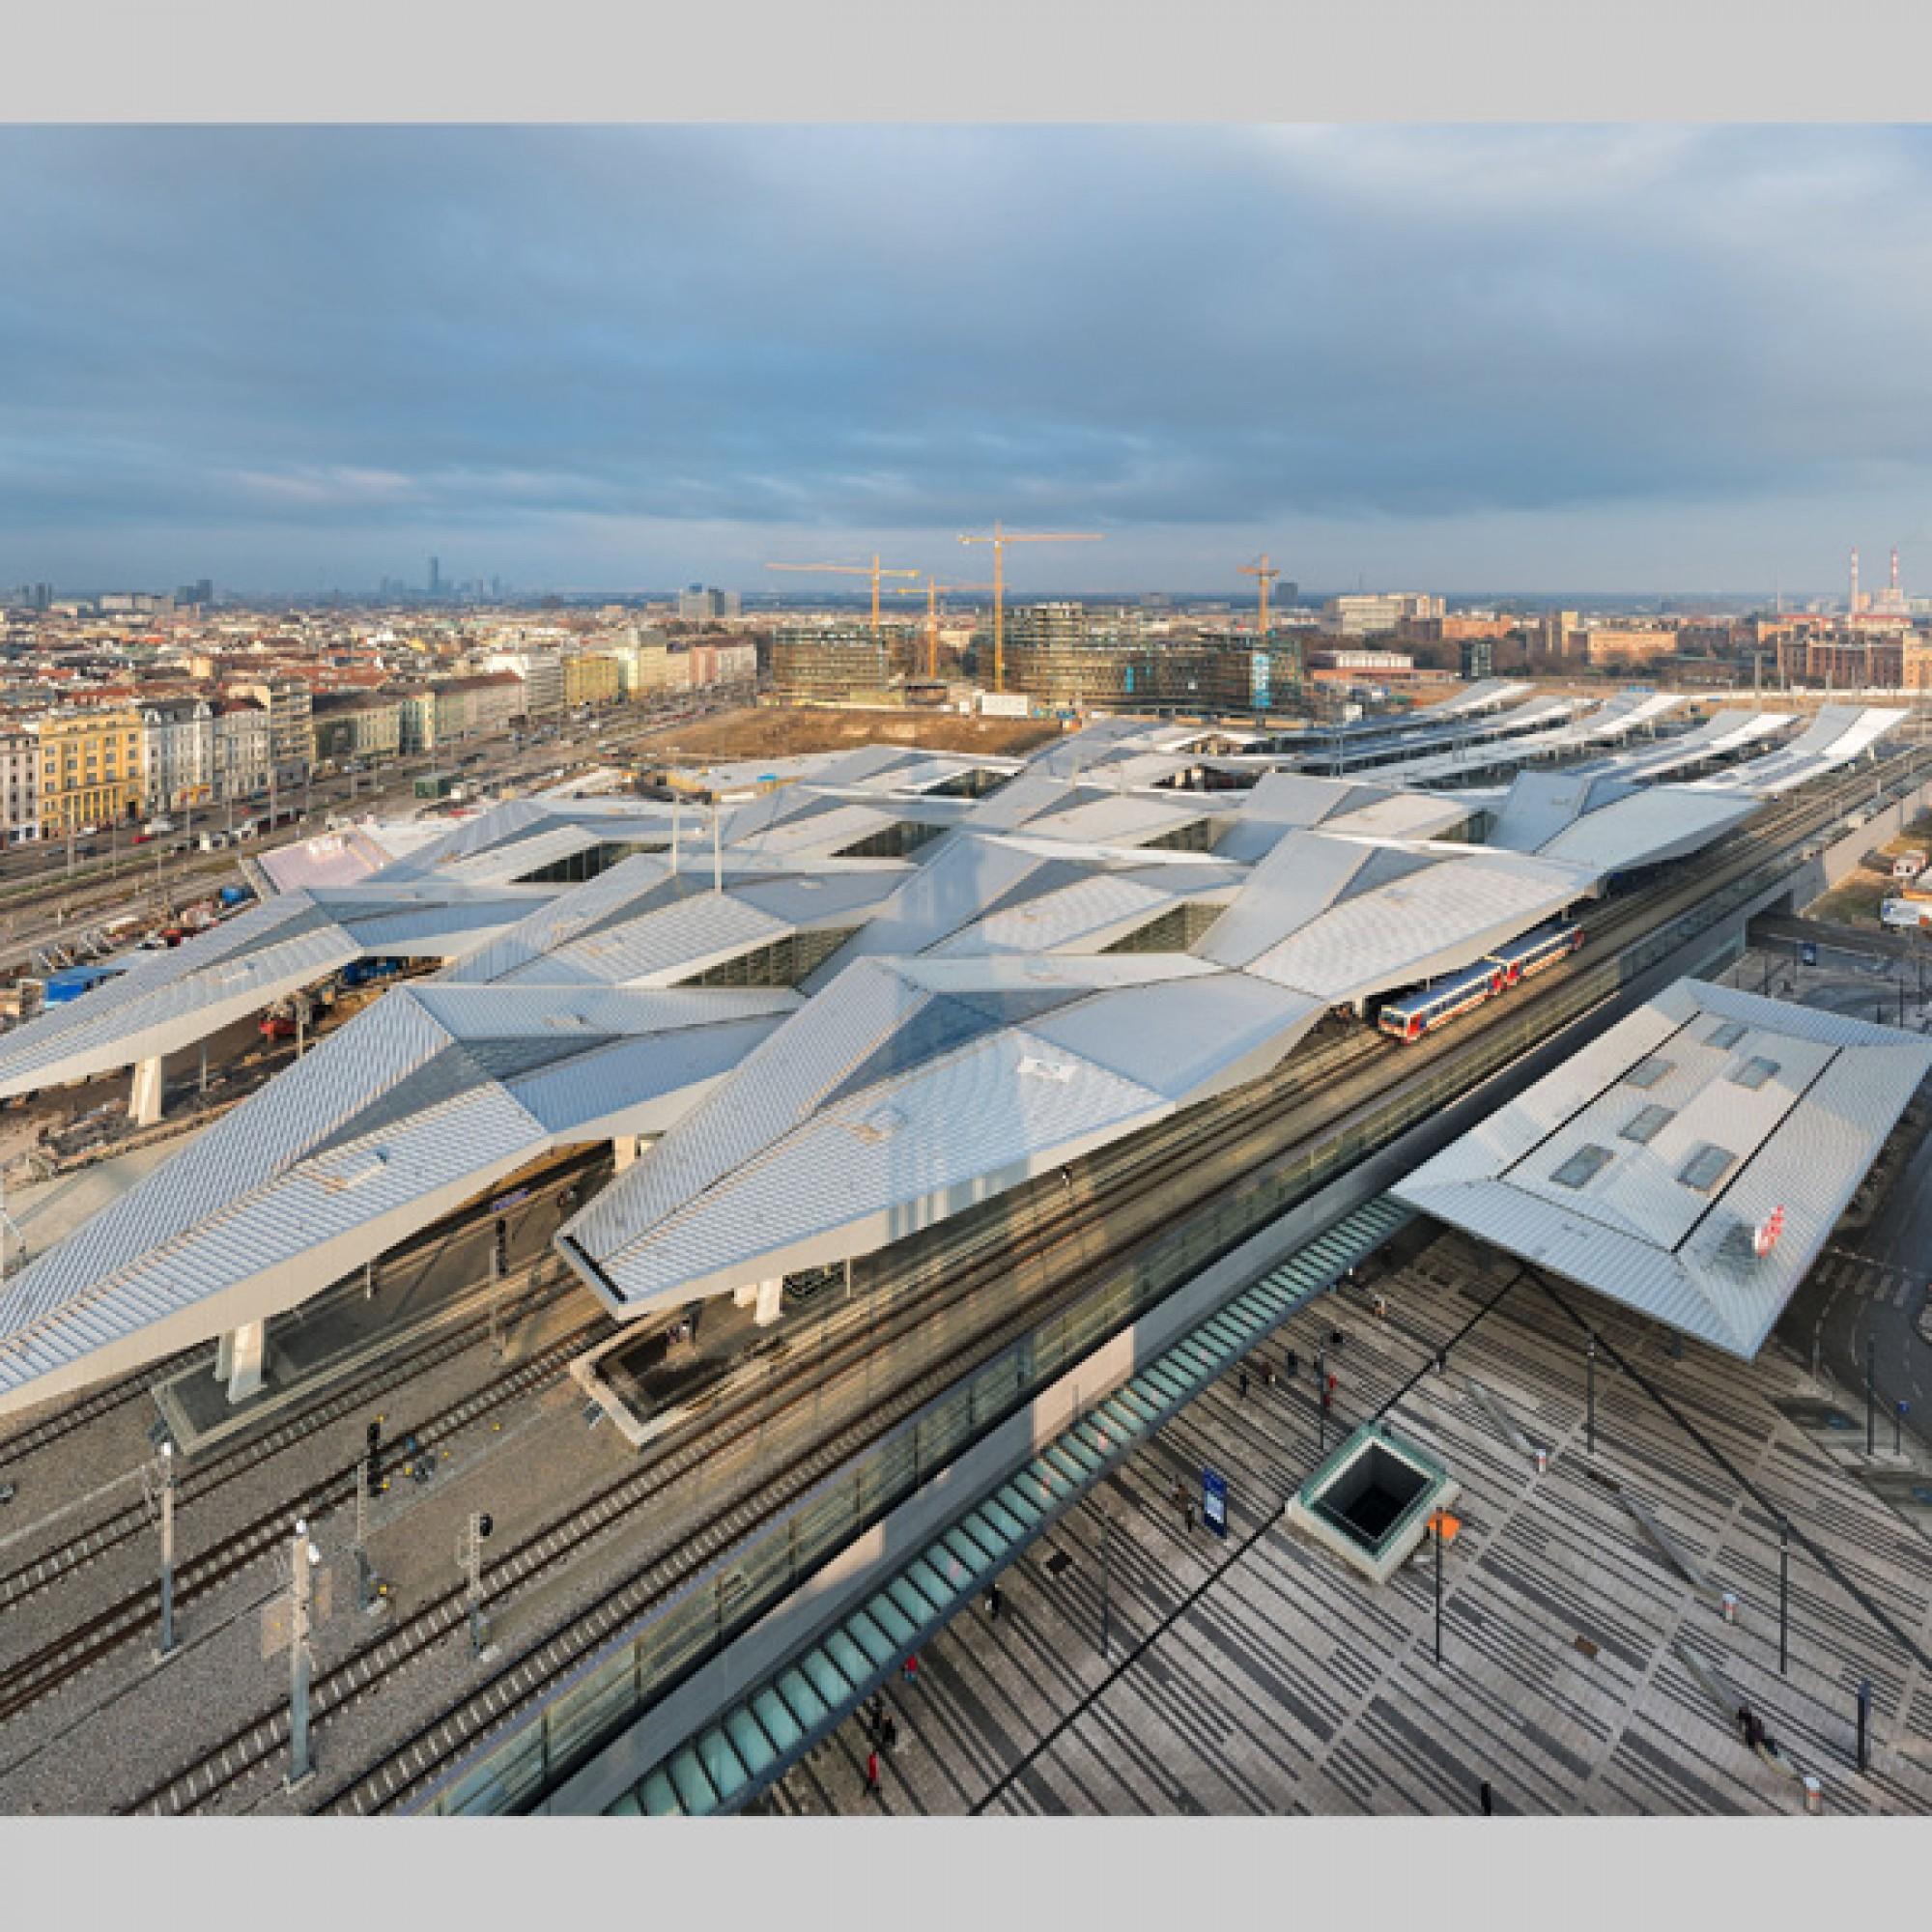 Dach des Wiener Hauptbahnhofs (Roman Bönsch)